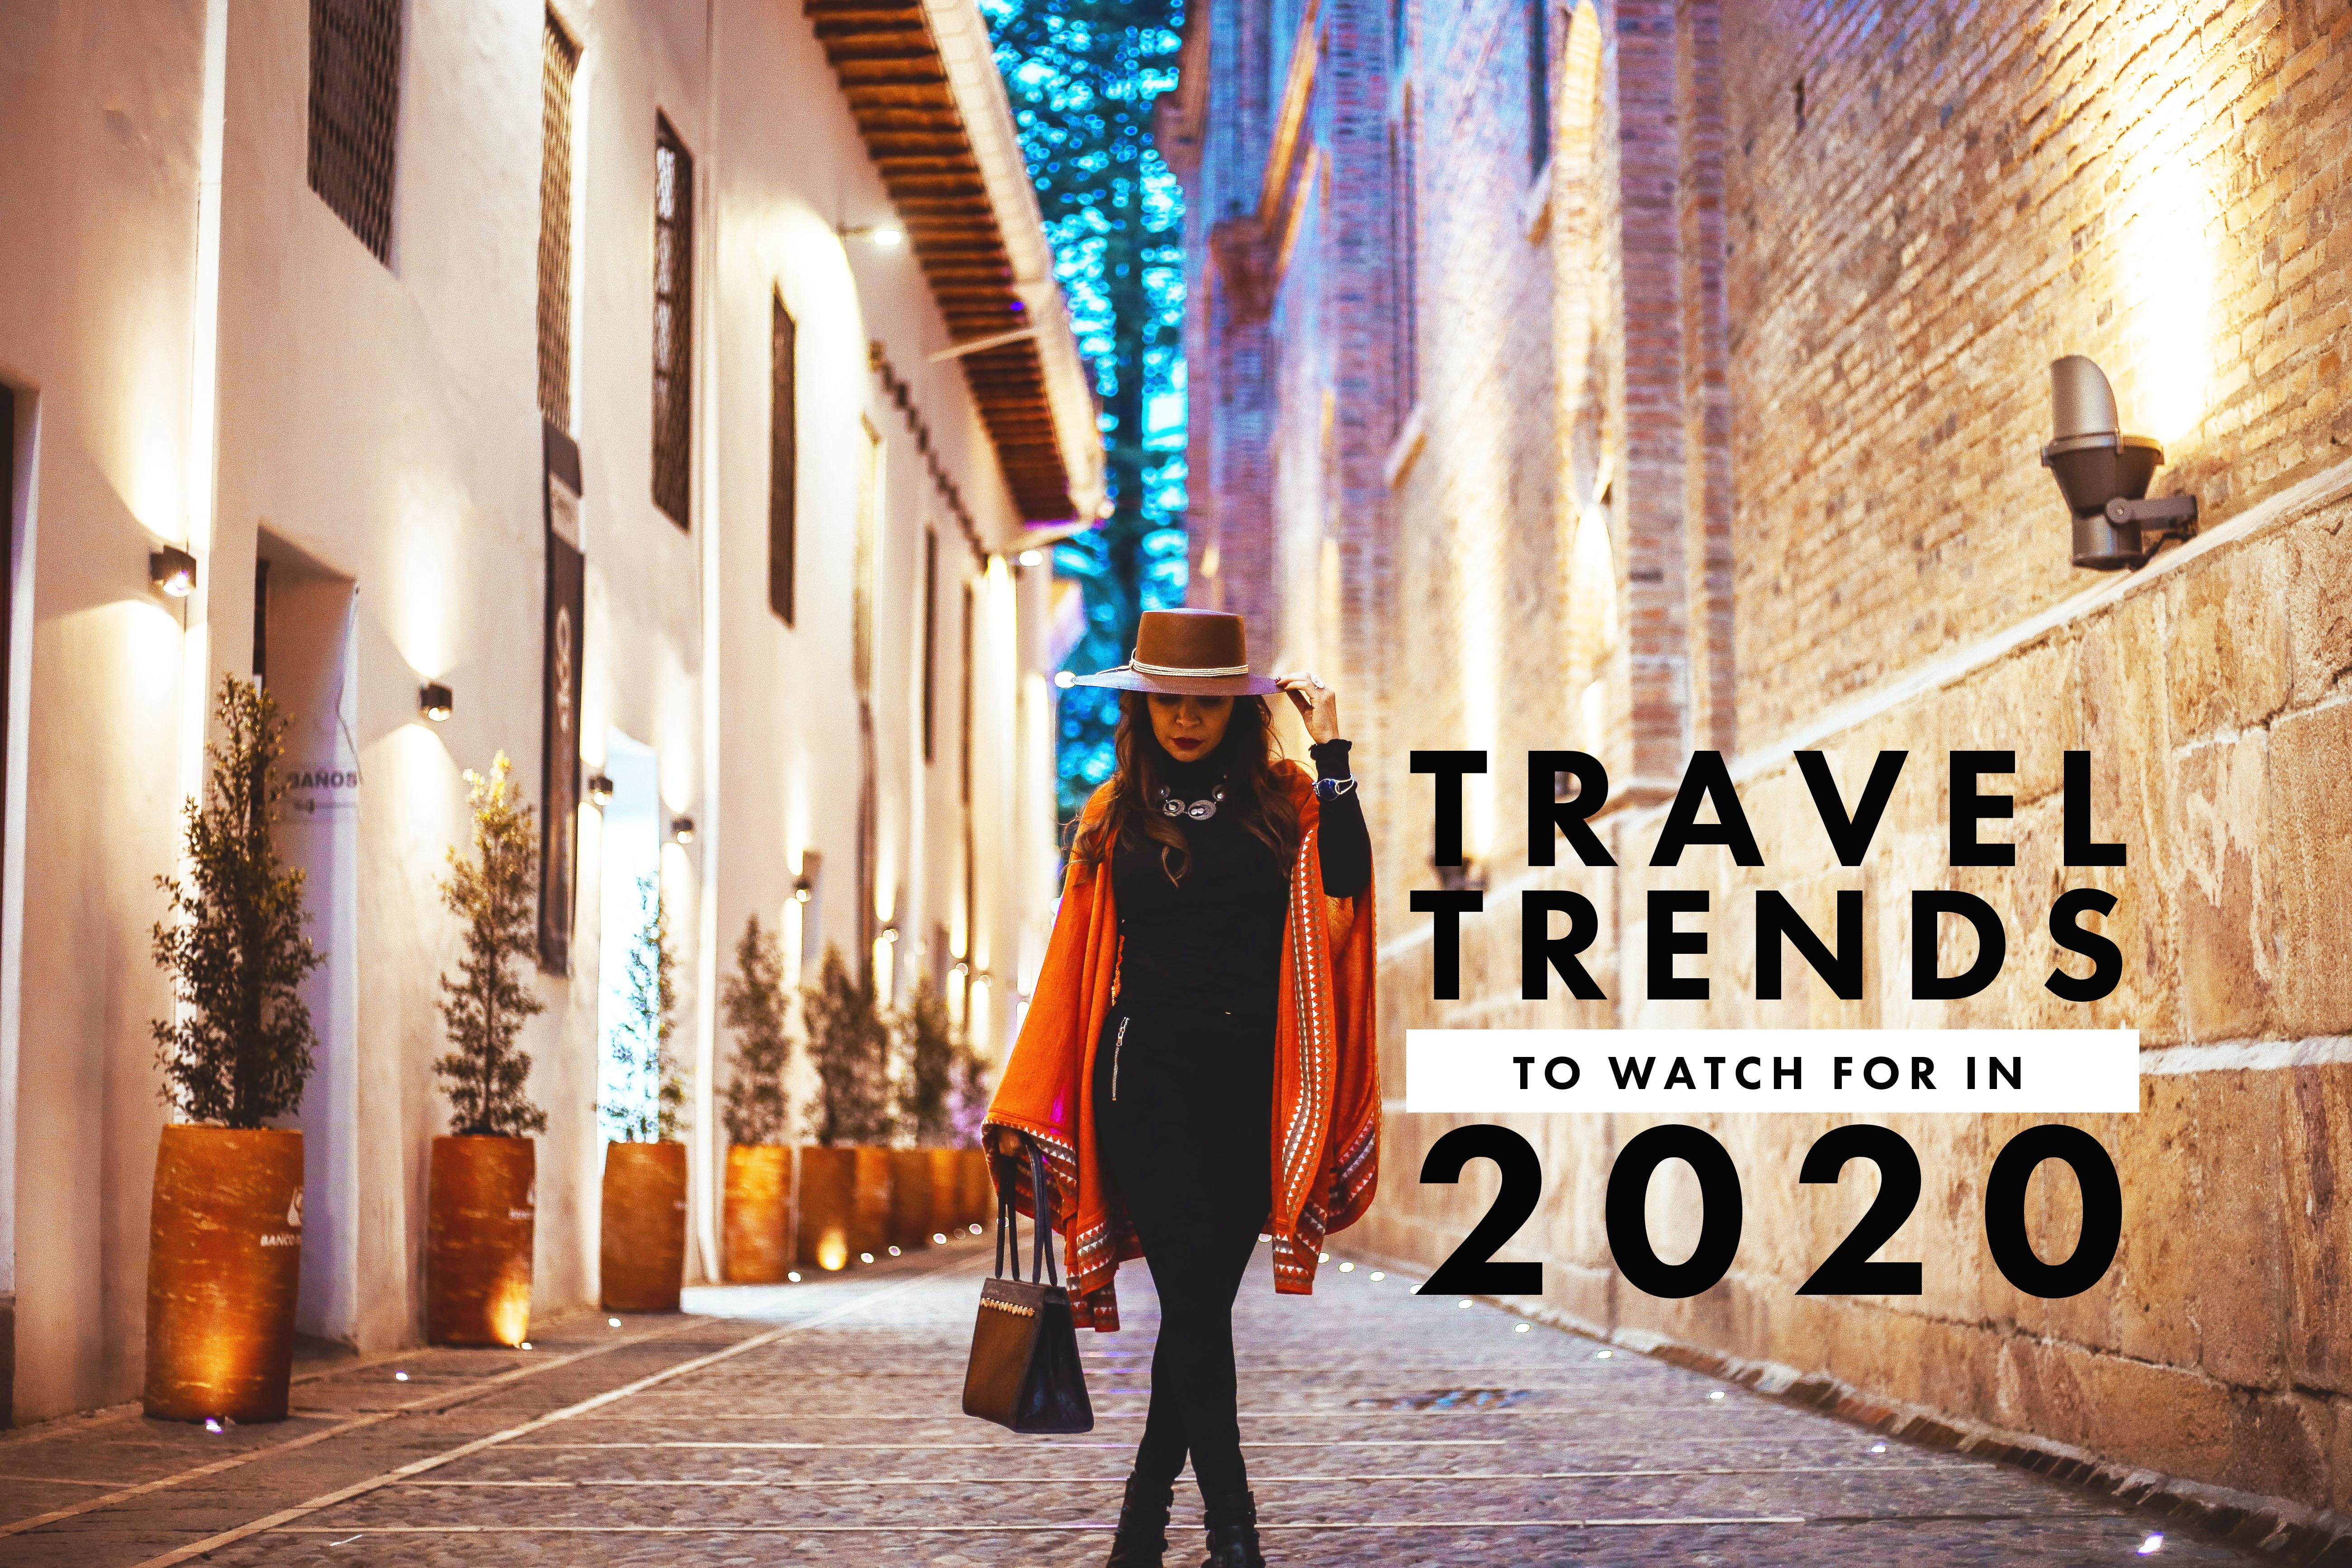 2020 travel trends